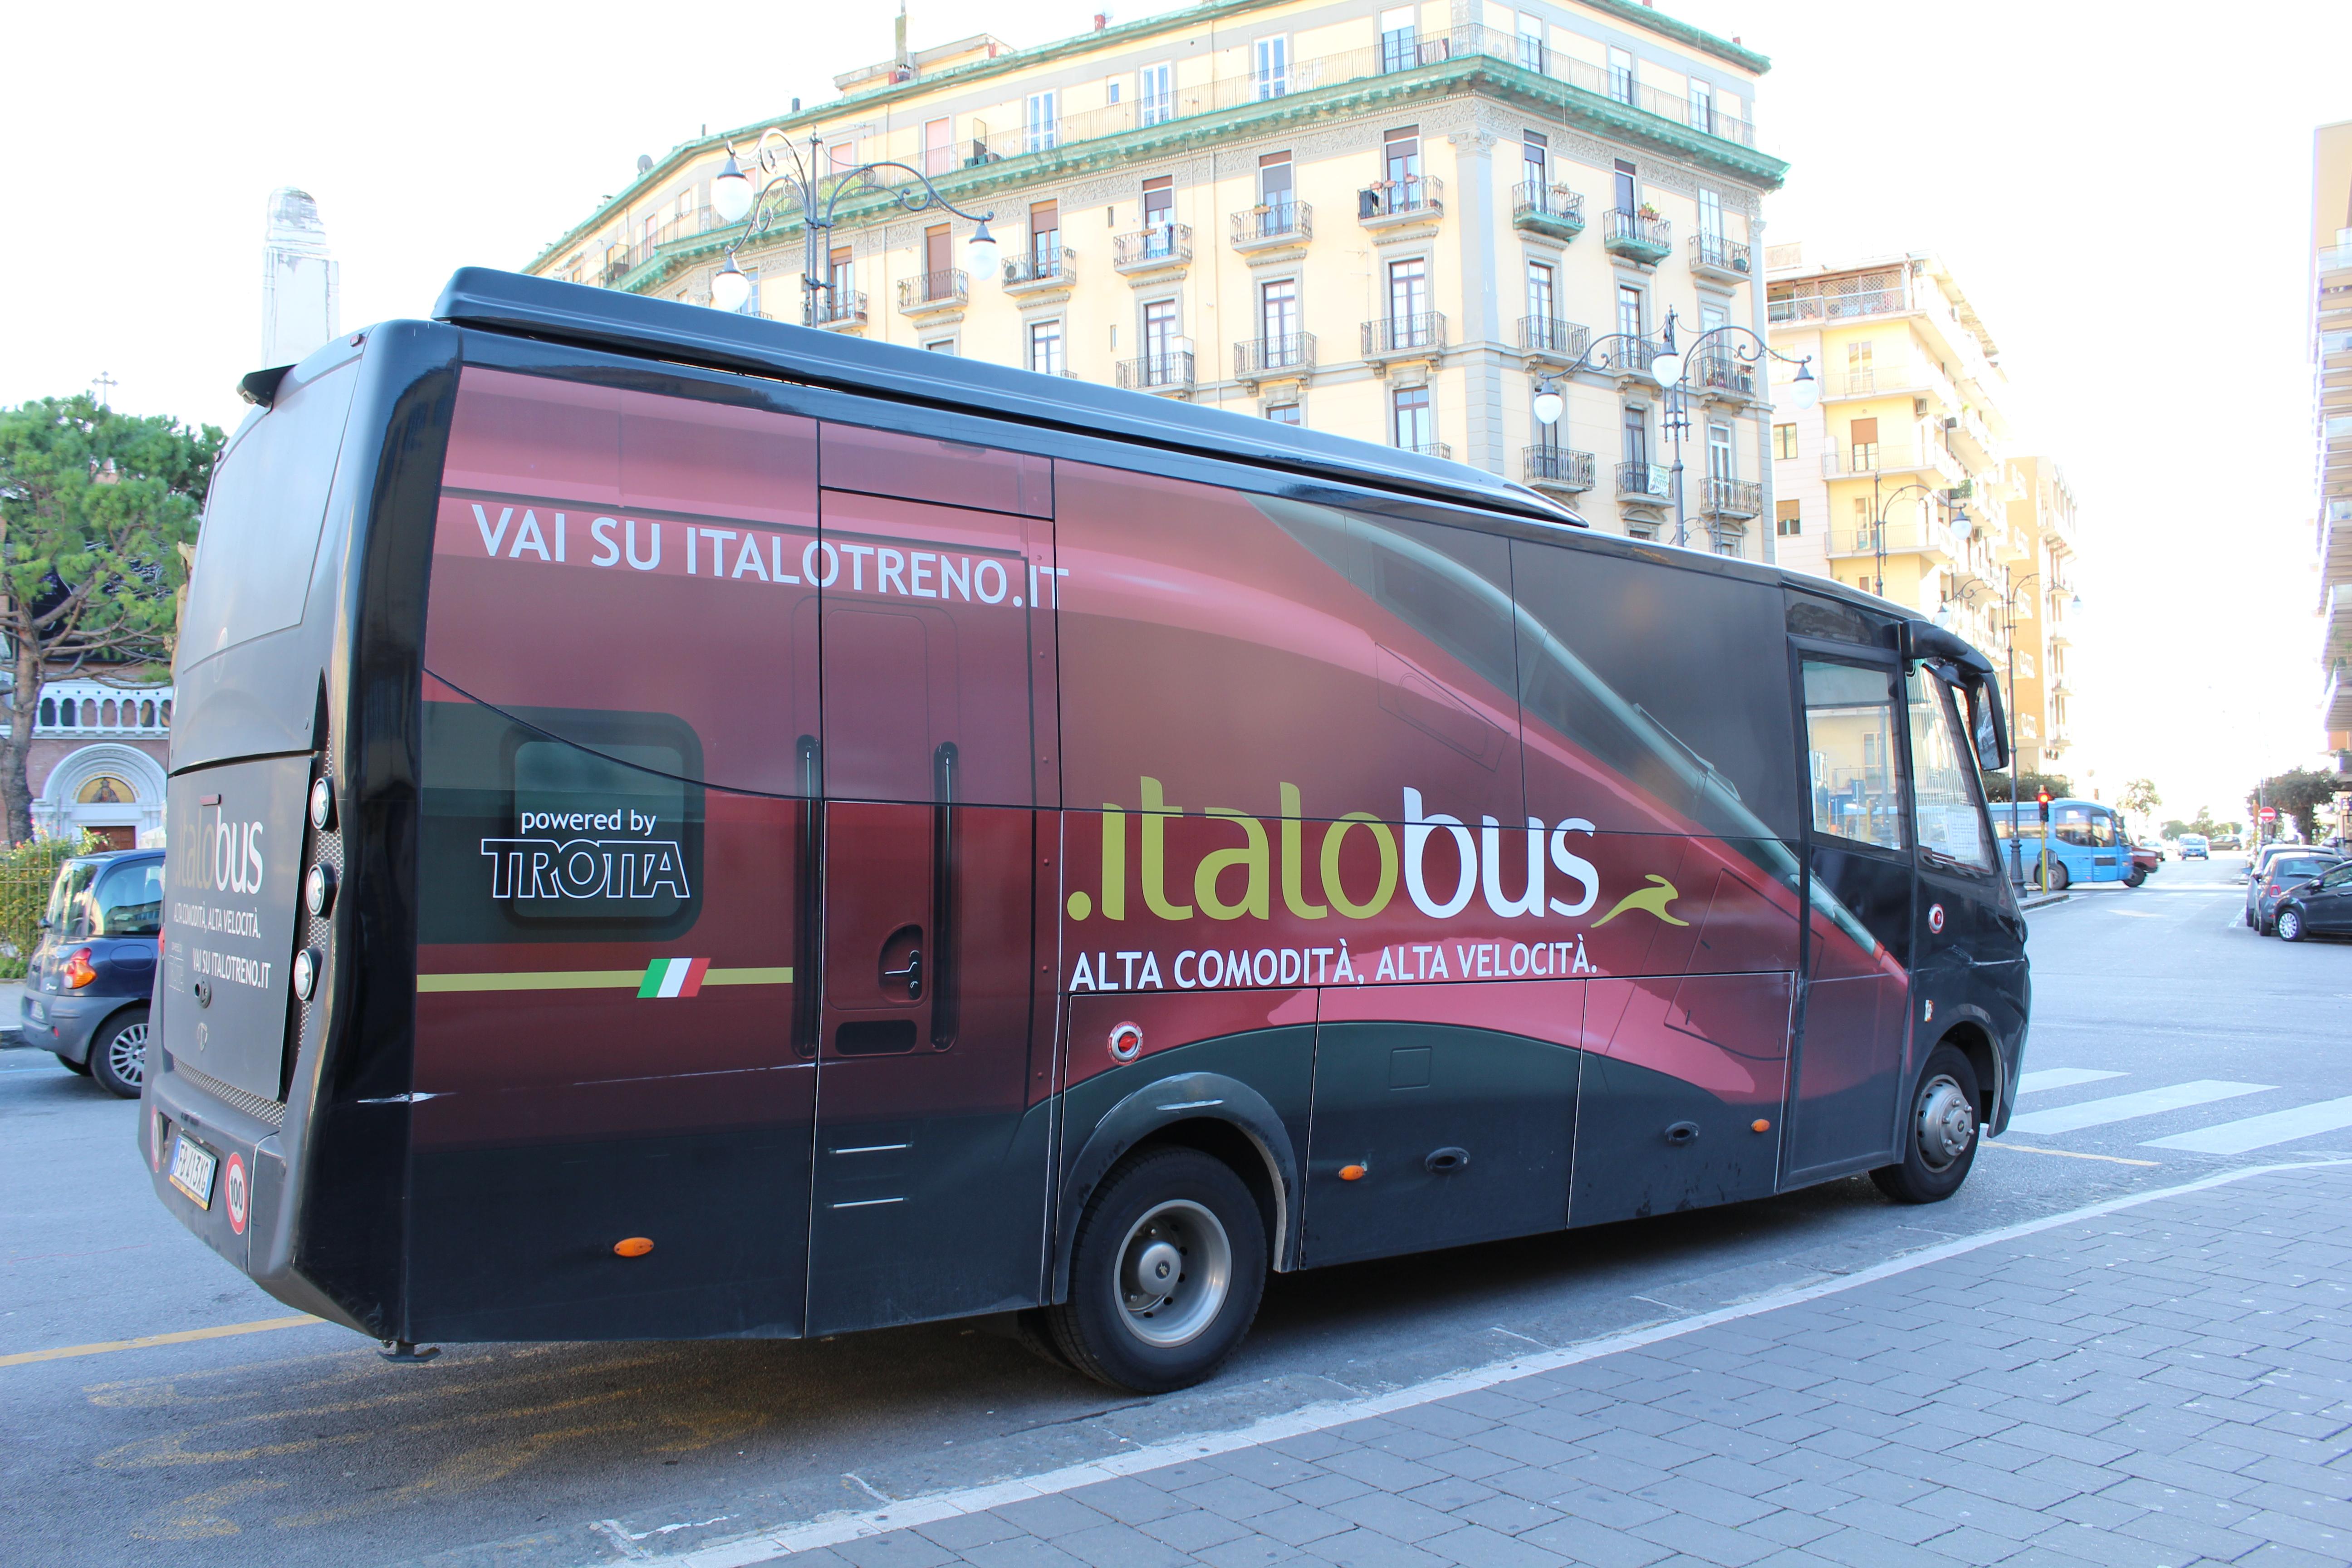 Italo bus